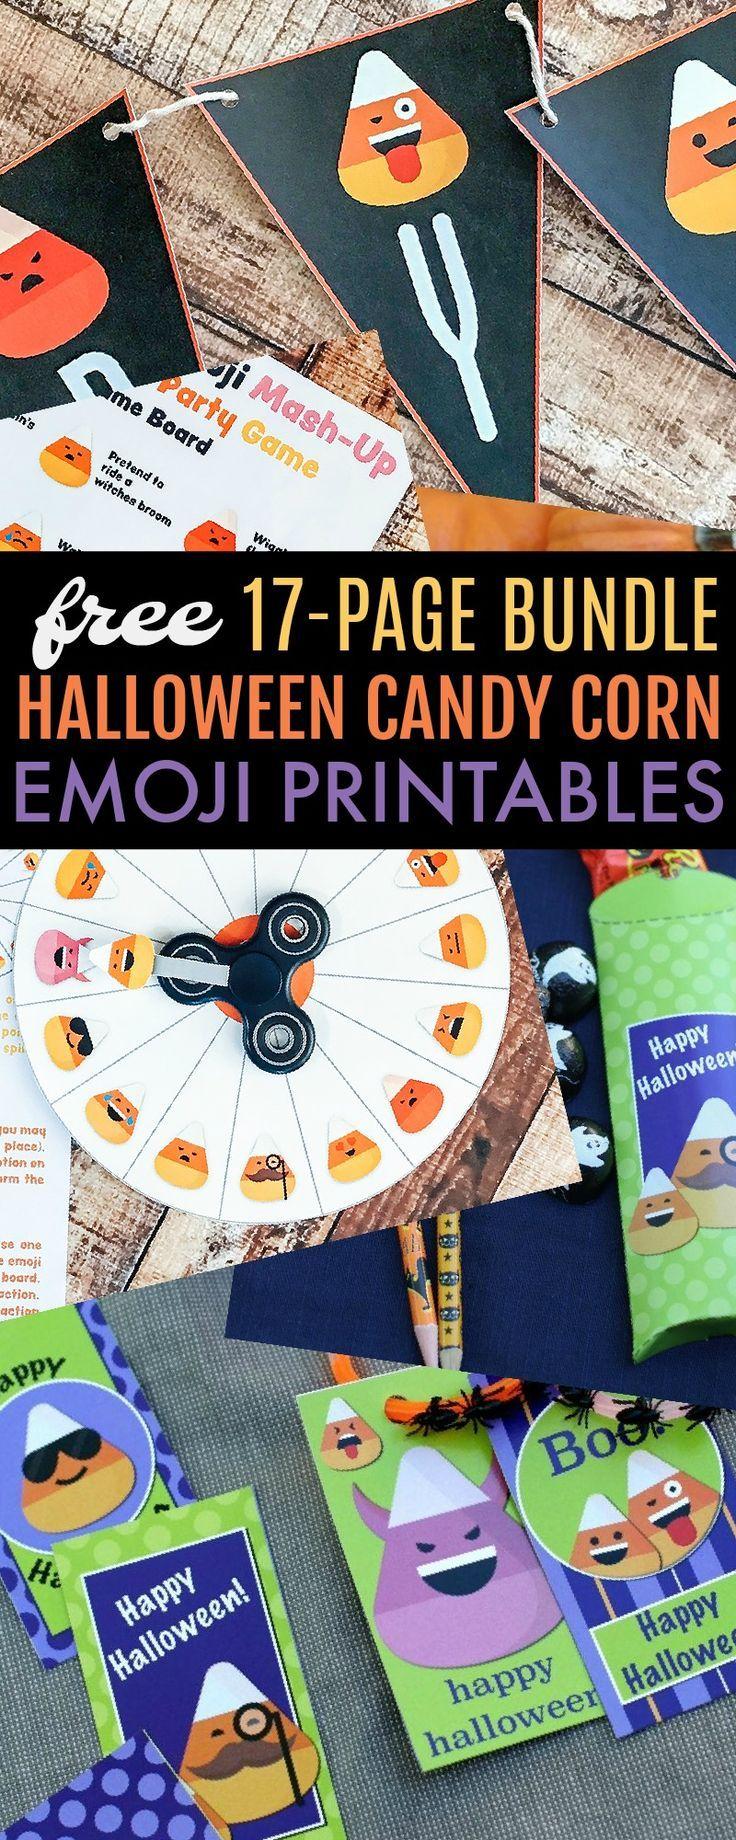 FREE Halloween Candy Corn Emoji Printable Bundle